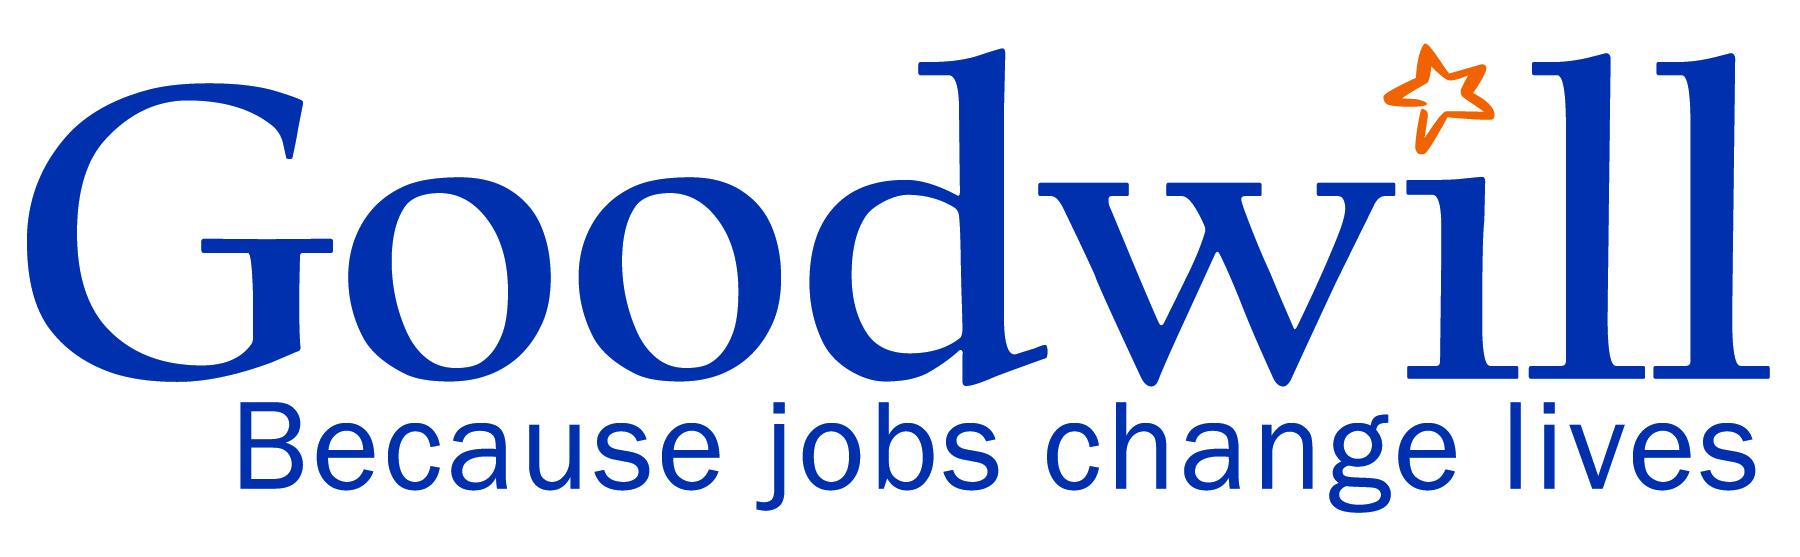 GW_Logo-01.jpg